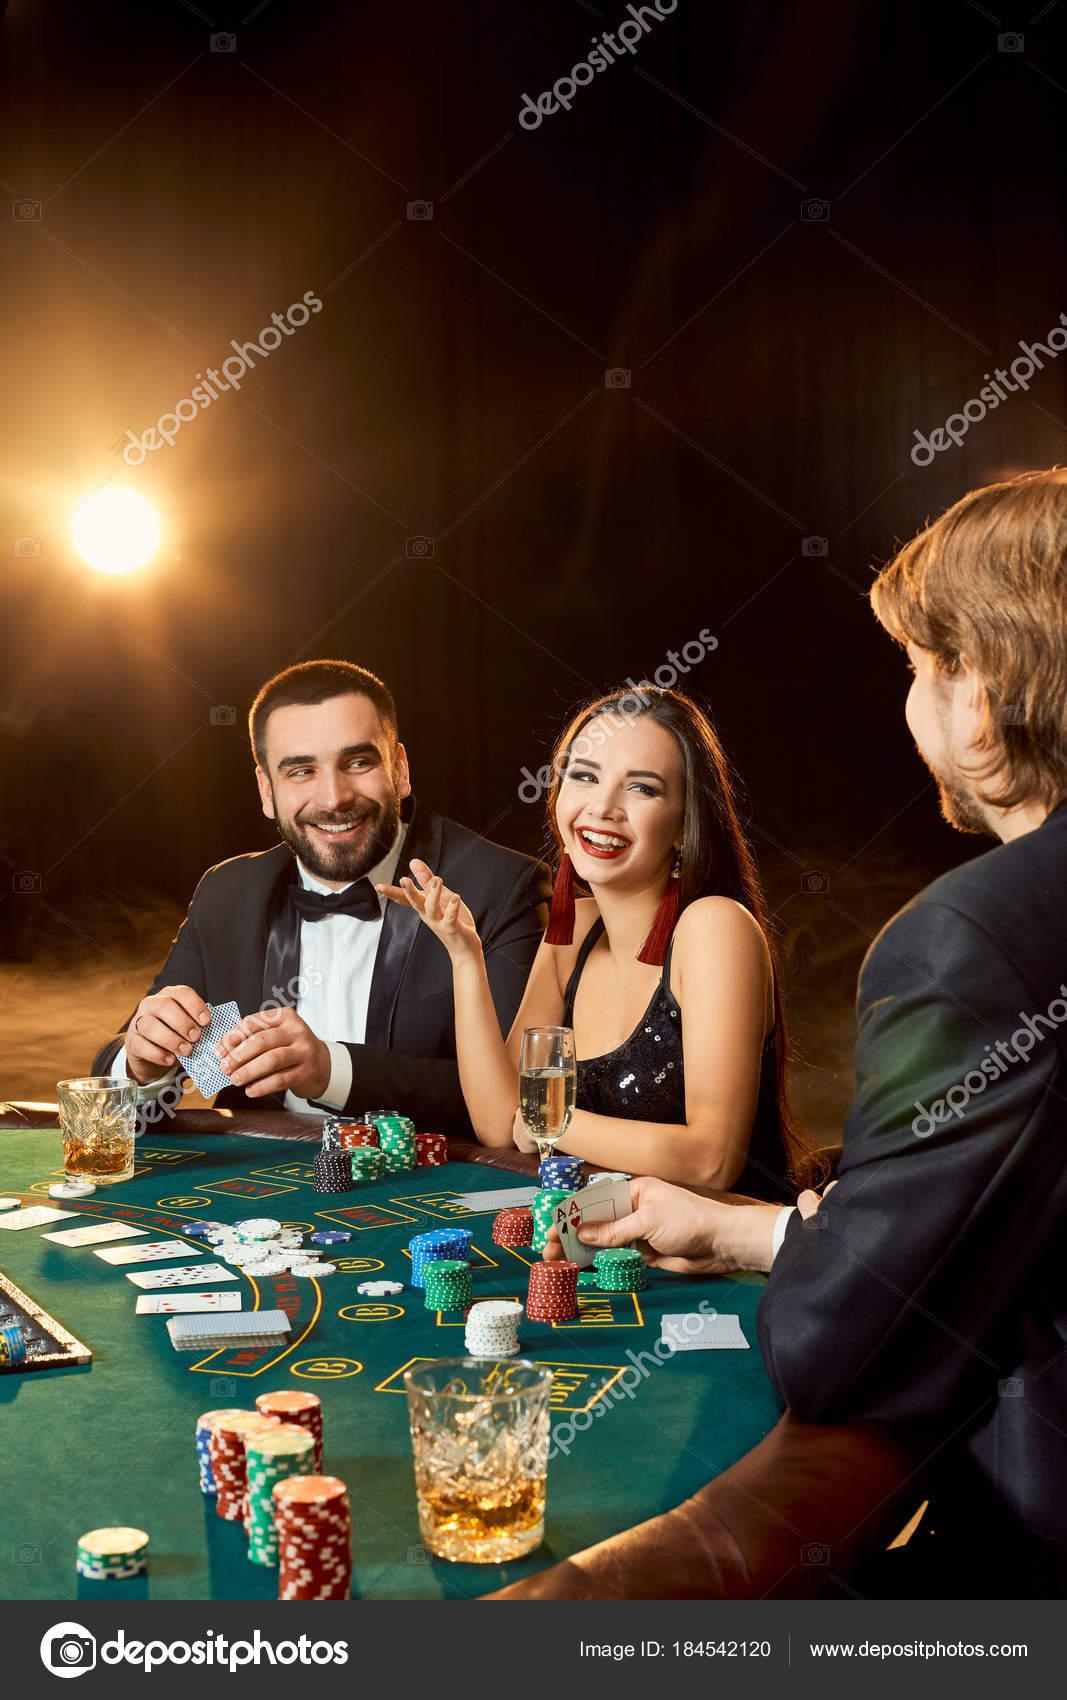 Wie spielt man poker im casino james bond casino royale length